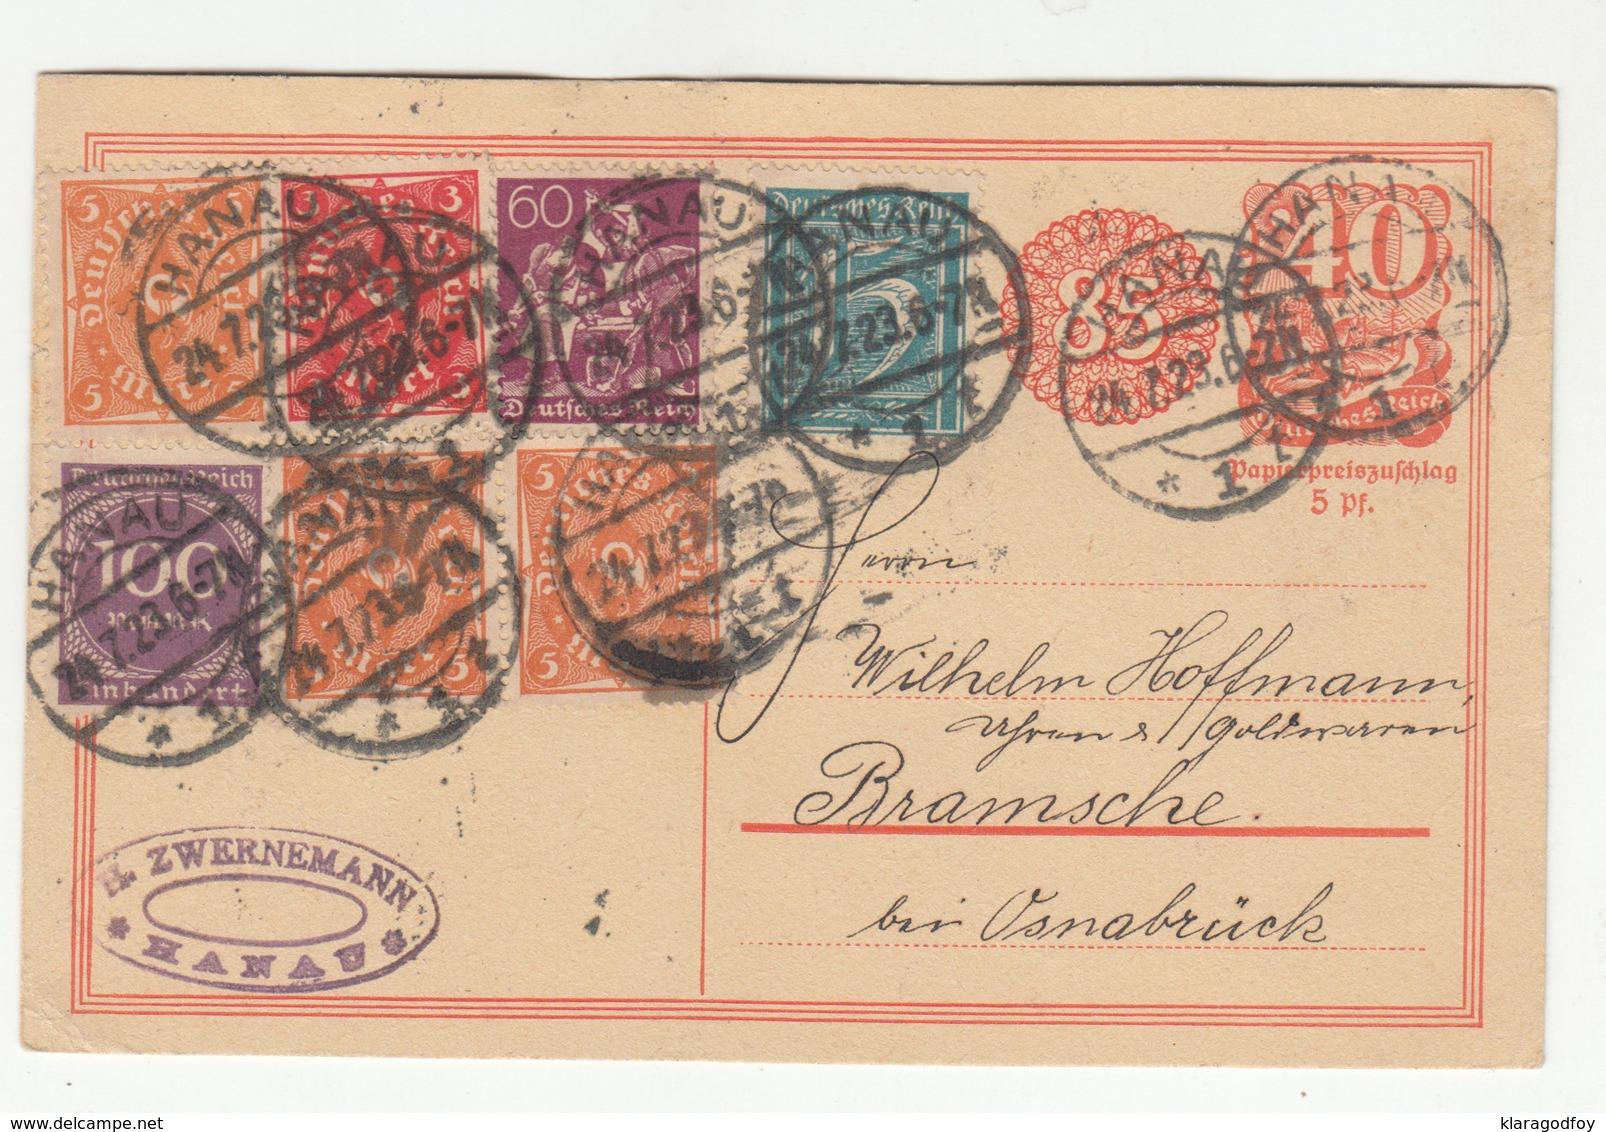 Germany Reich INFLA Postal Stationery Postcard Travelled 1923 Hanau To Bramsche B190701 - Germania